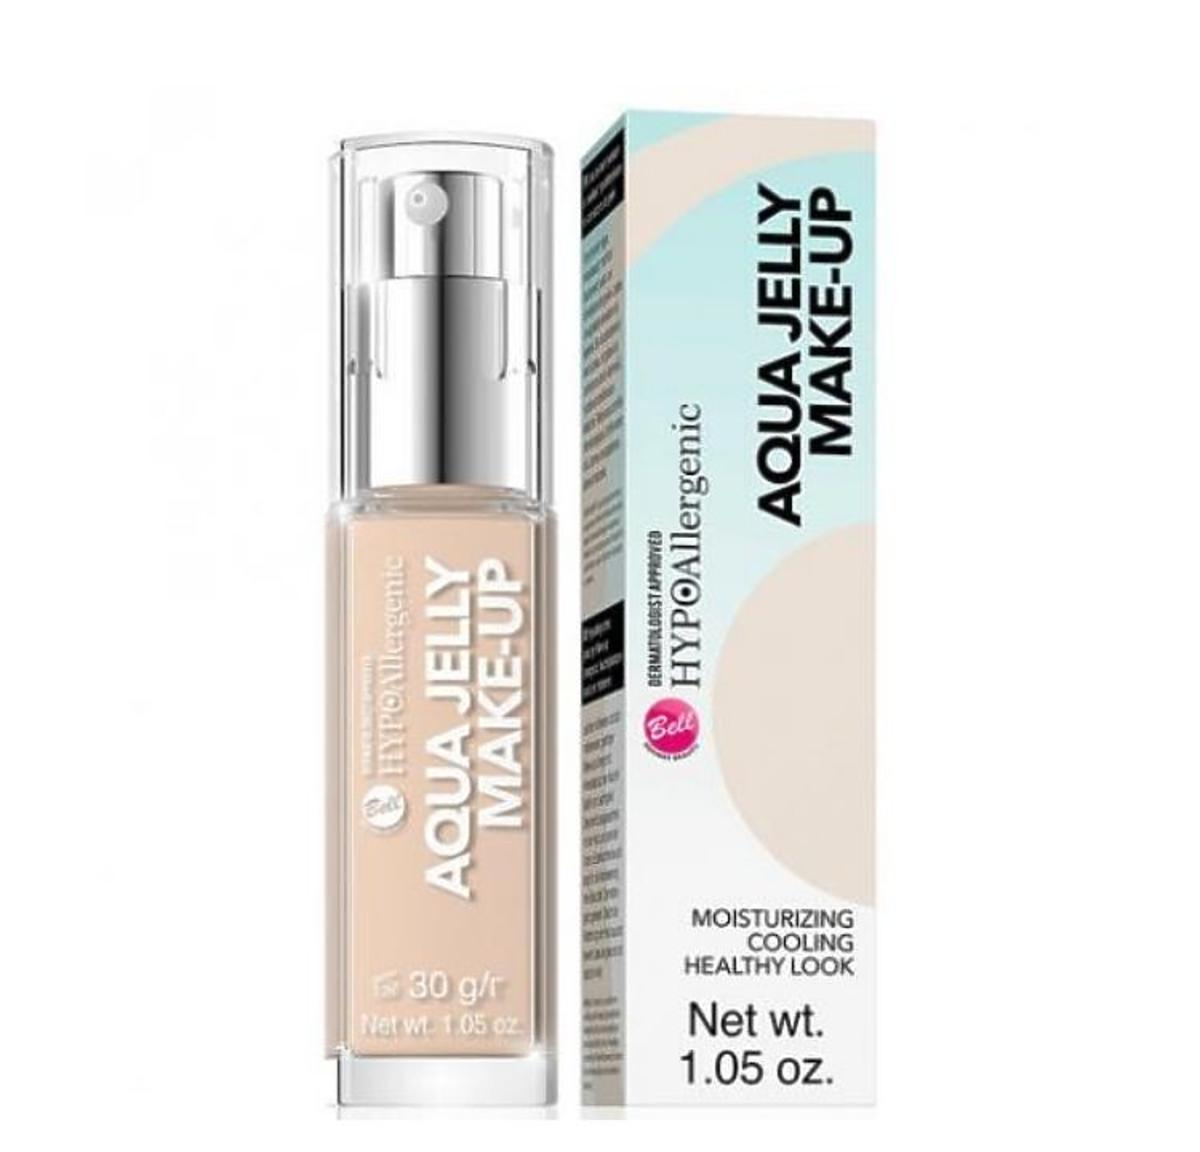 Podkład Aqua Jelly Make-Up marki Bell z serii Hypoallergenic